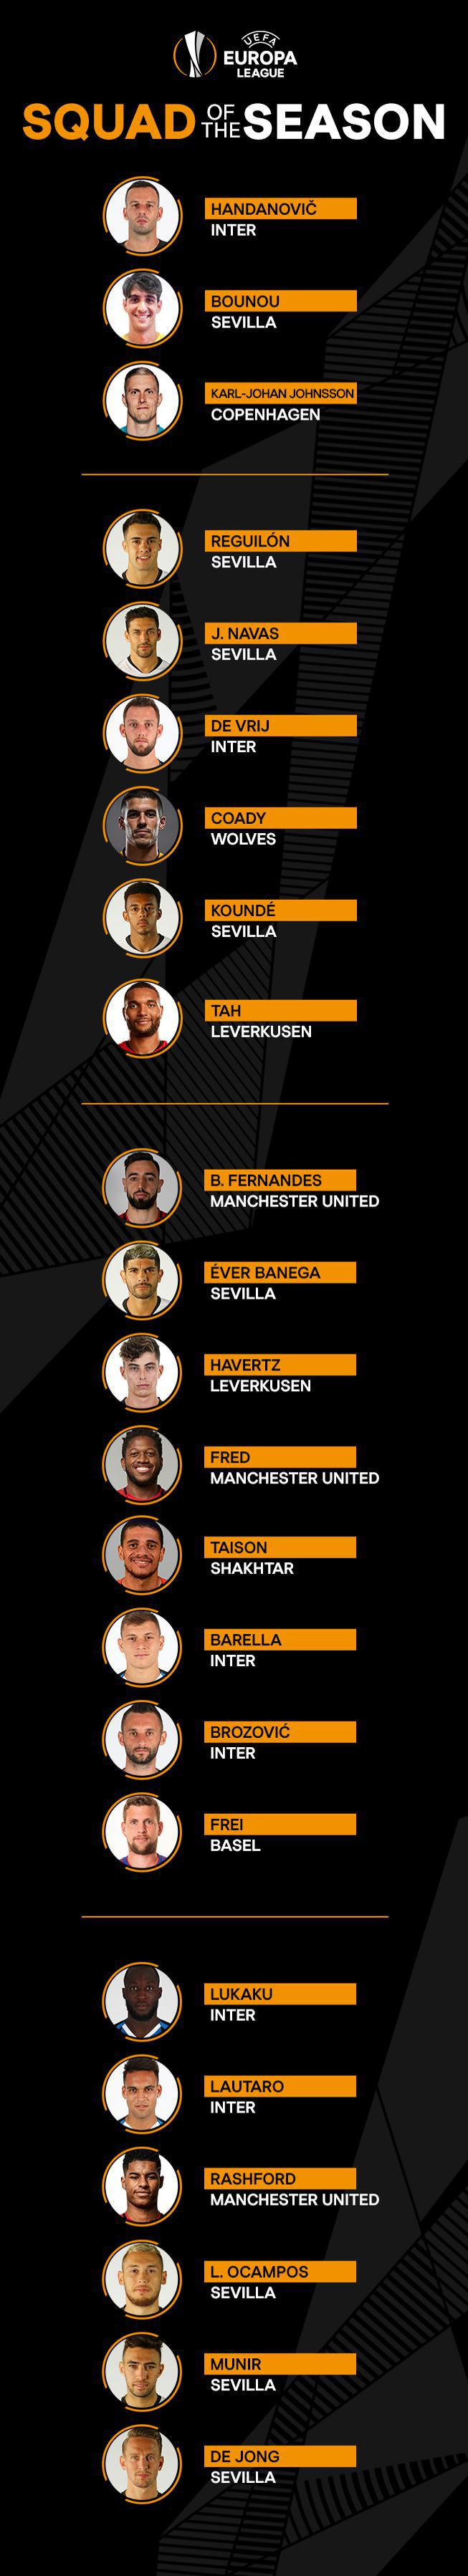 uefa europa league squad of the season uefa europa league uefa com uefa europa league squad of the season